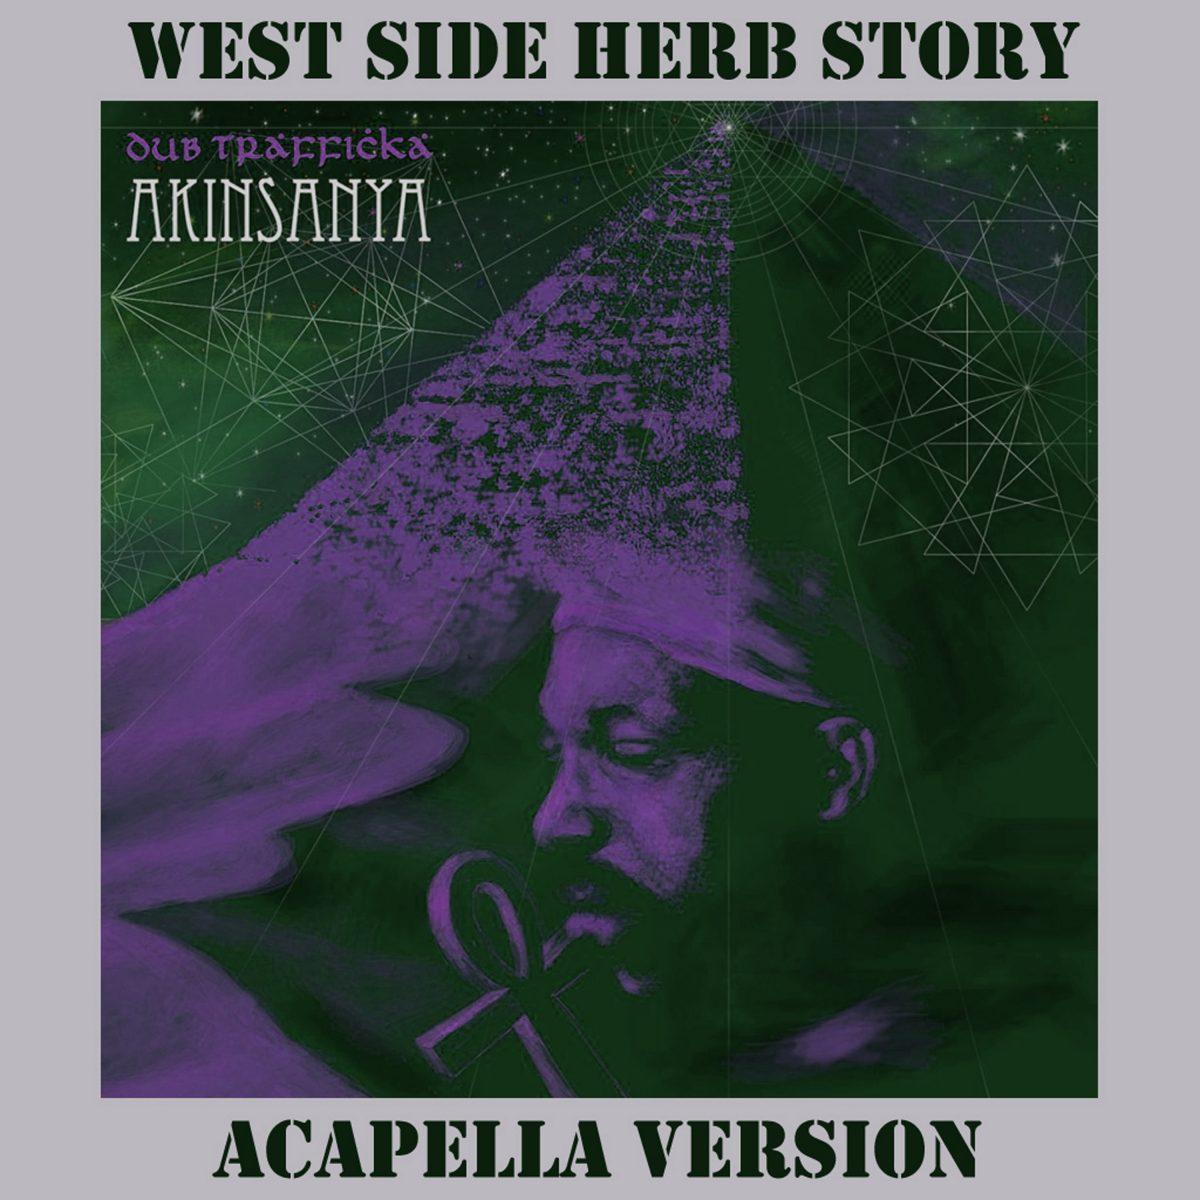 Akinsanya - West Side Herb Story (Acapella Version)